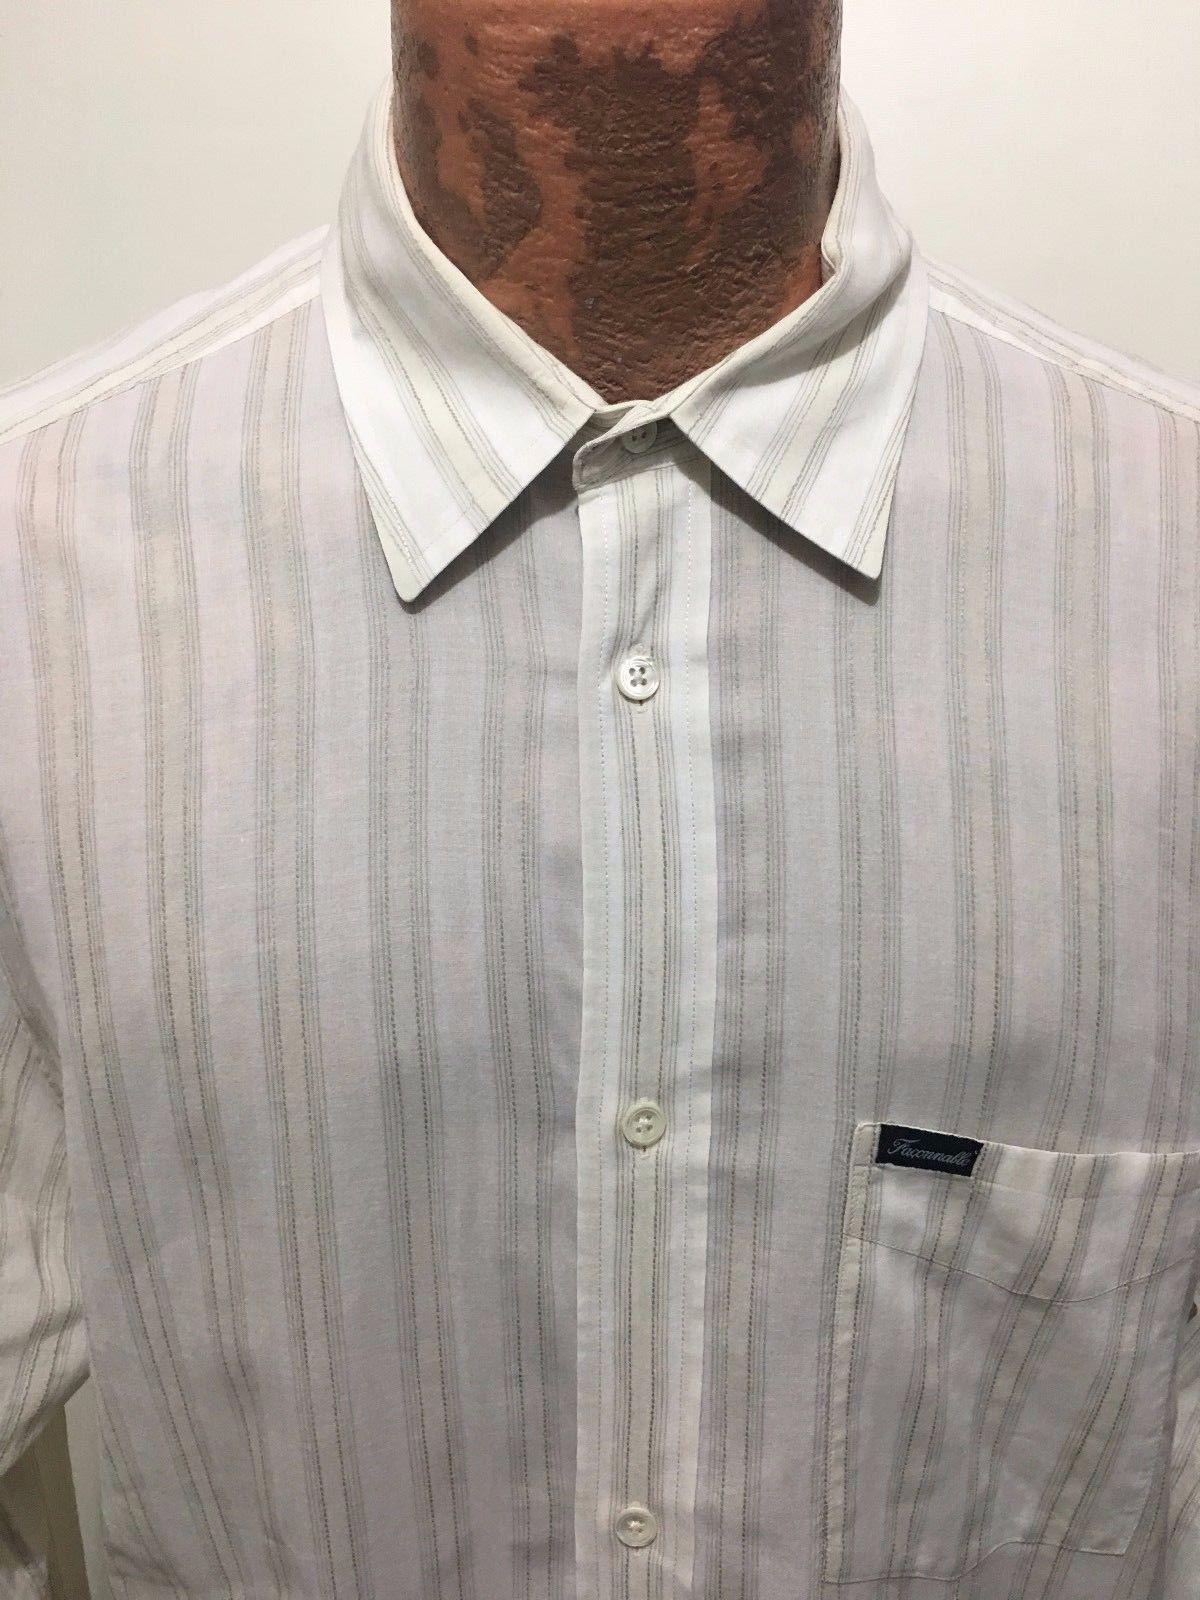 a180fa95 S l1600. S l1600. Previous. Faconnable Mens L Beige White Striped Cotton Linen  Long-Sleeve Shirt Lightweight